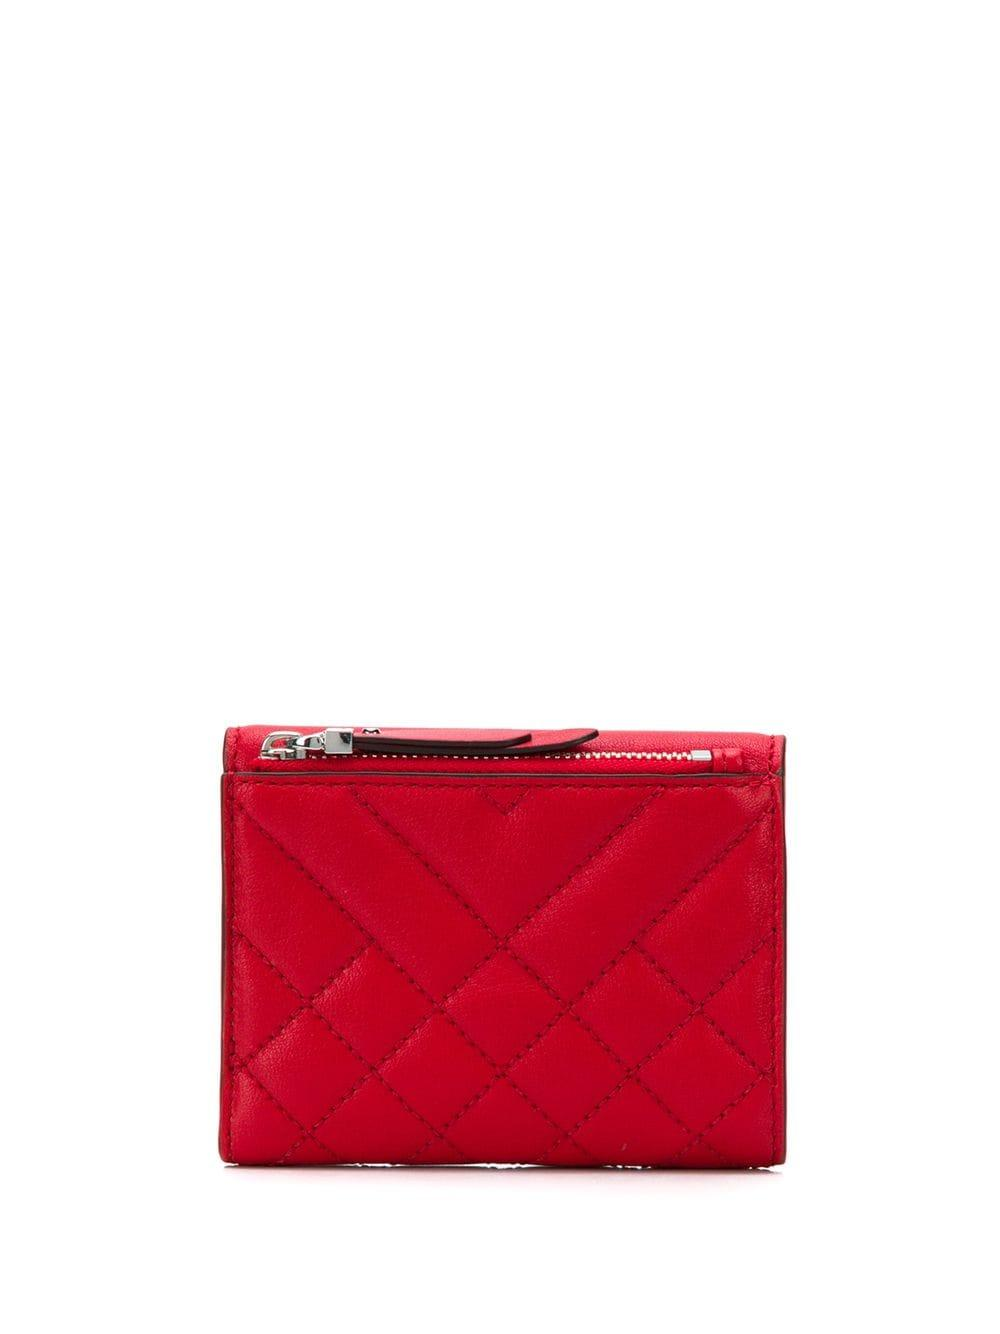 43369b2105e96 Lyst - MICHAEL Michael Kors Trifold Wallet in Red for Men